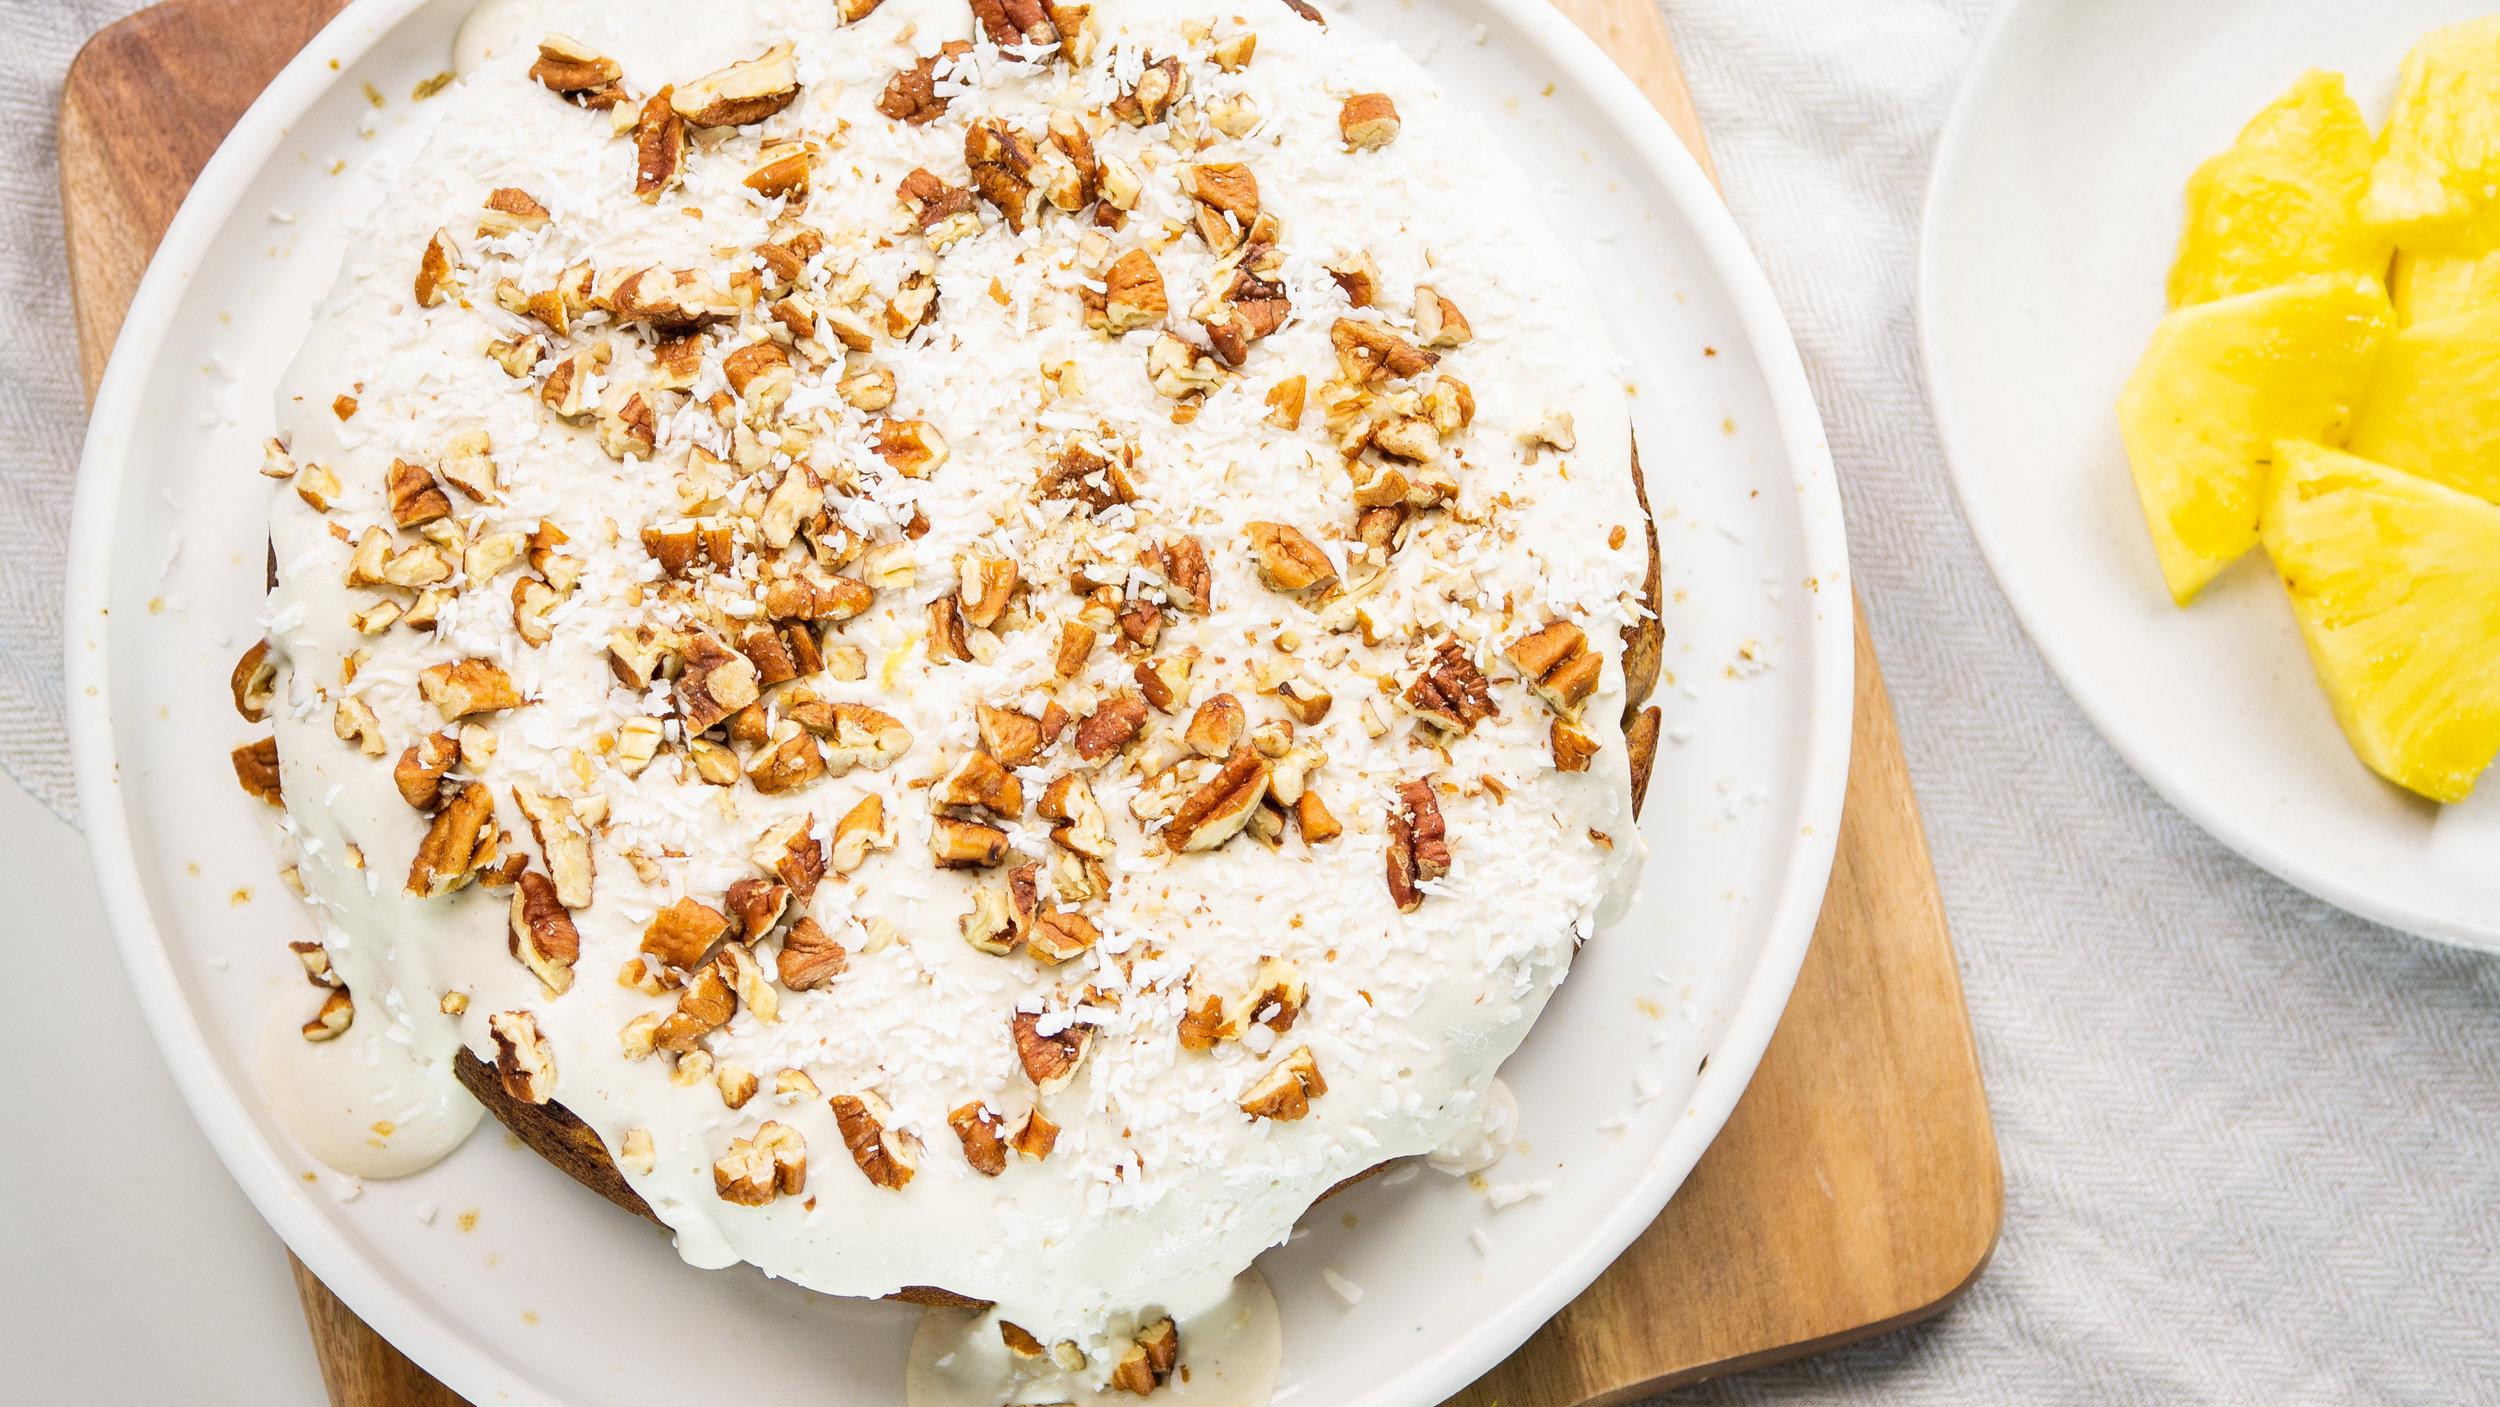 Dole Hummingbird Cake